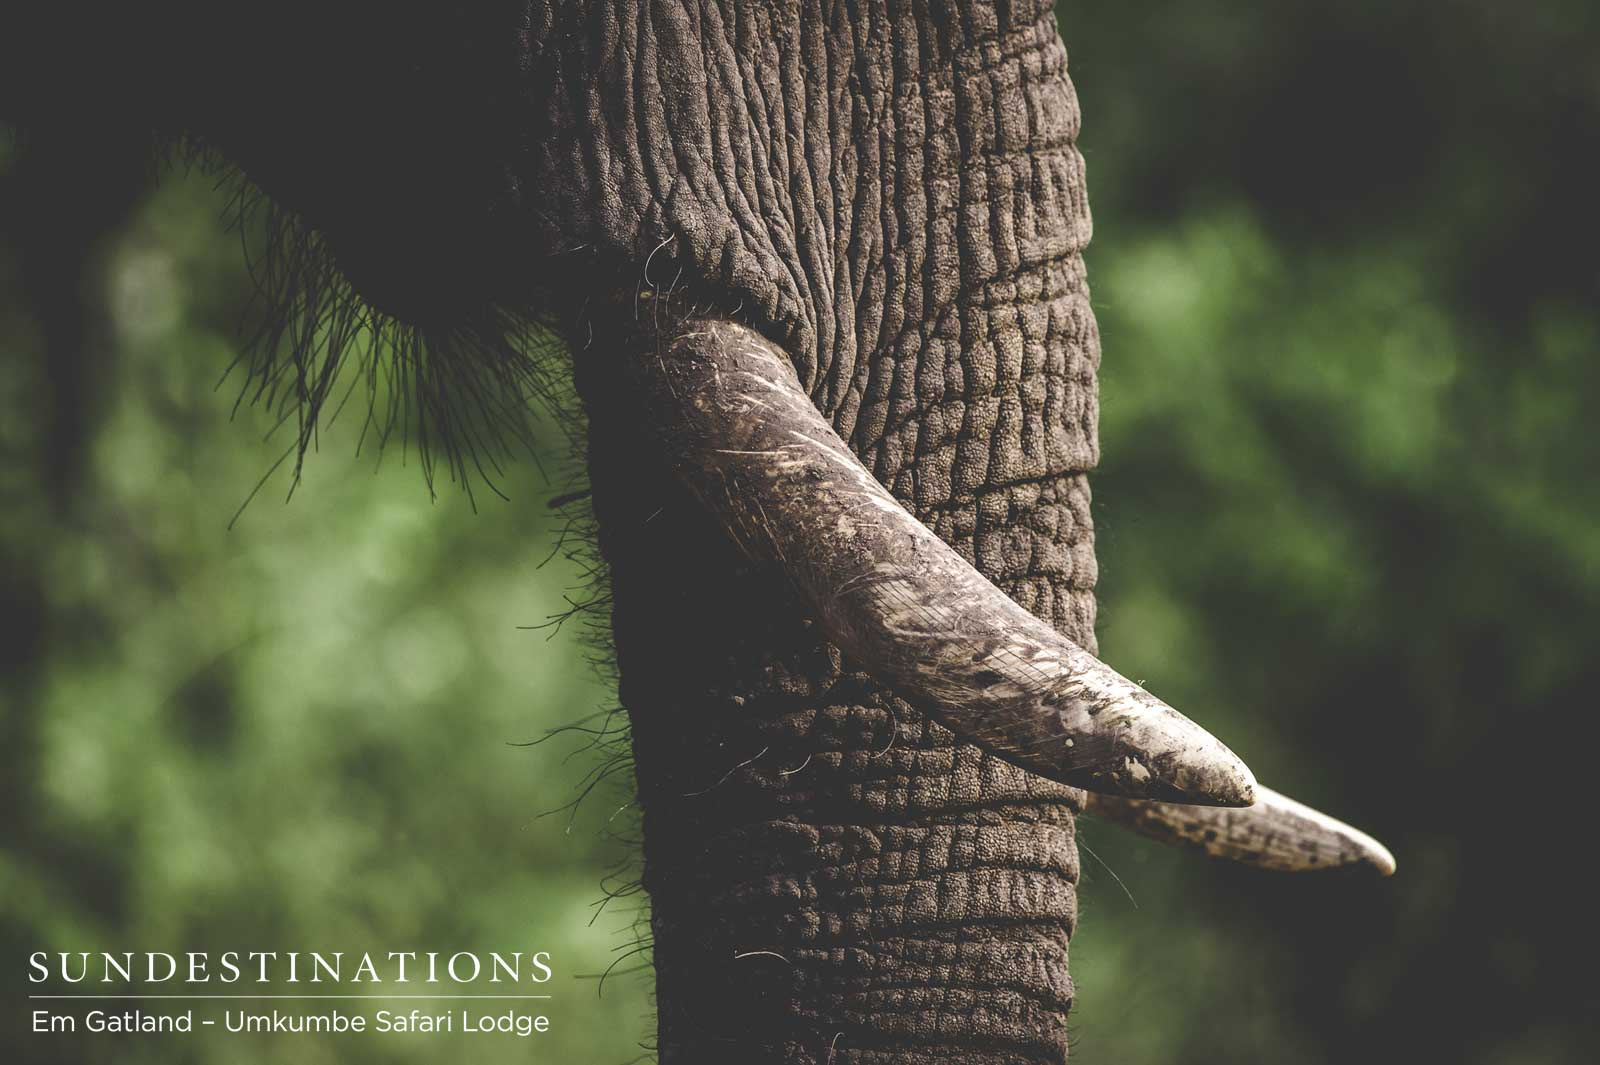 Umkumbe Safari Lodge : Understanding Our Emotional Grey Giants